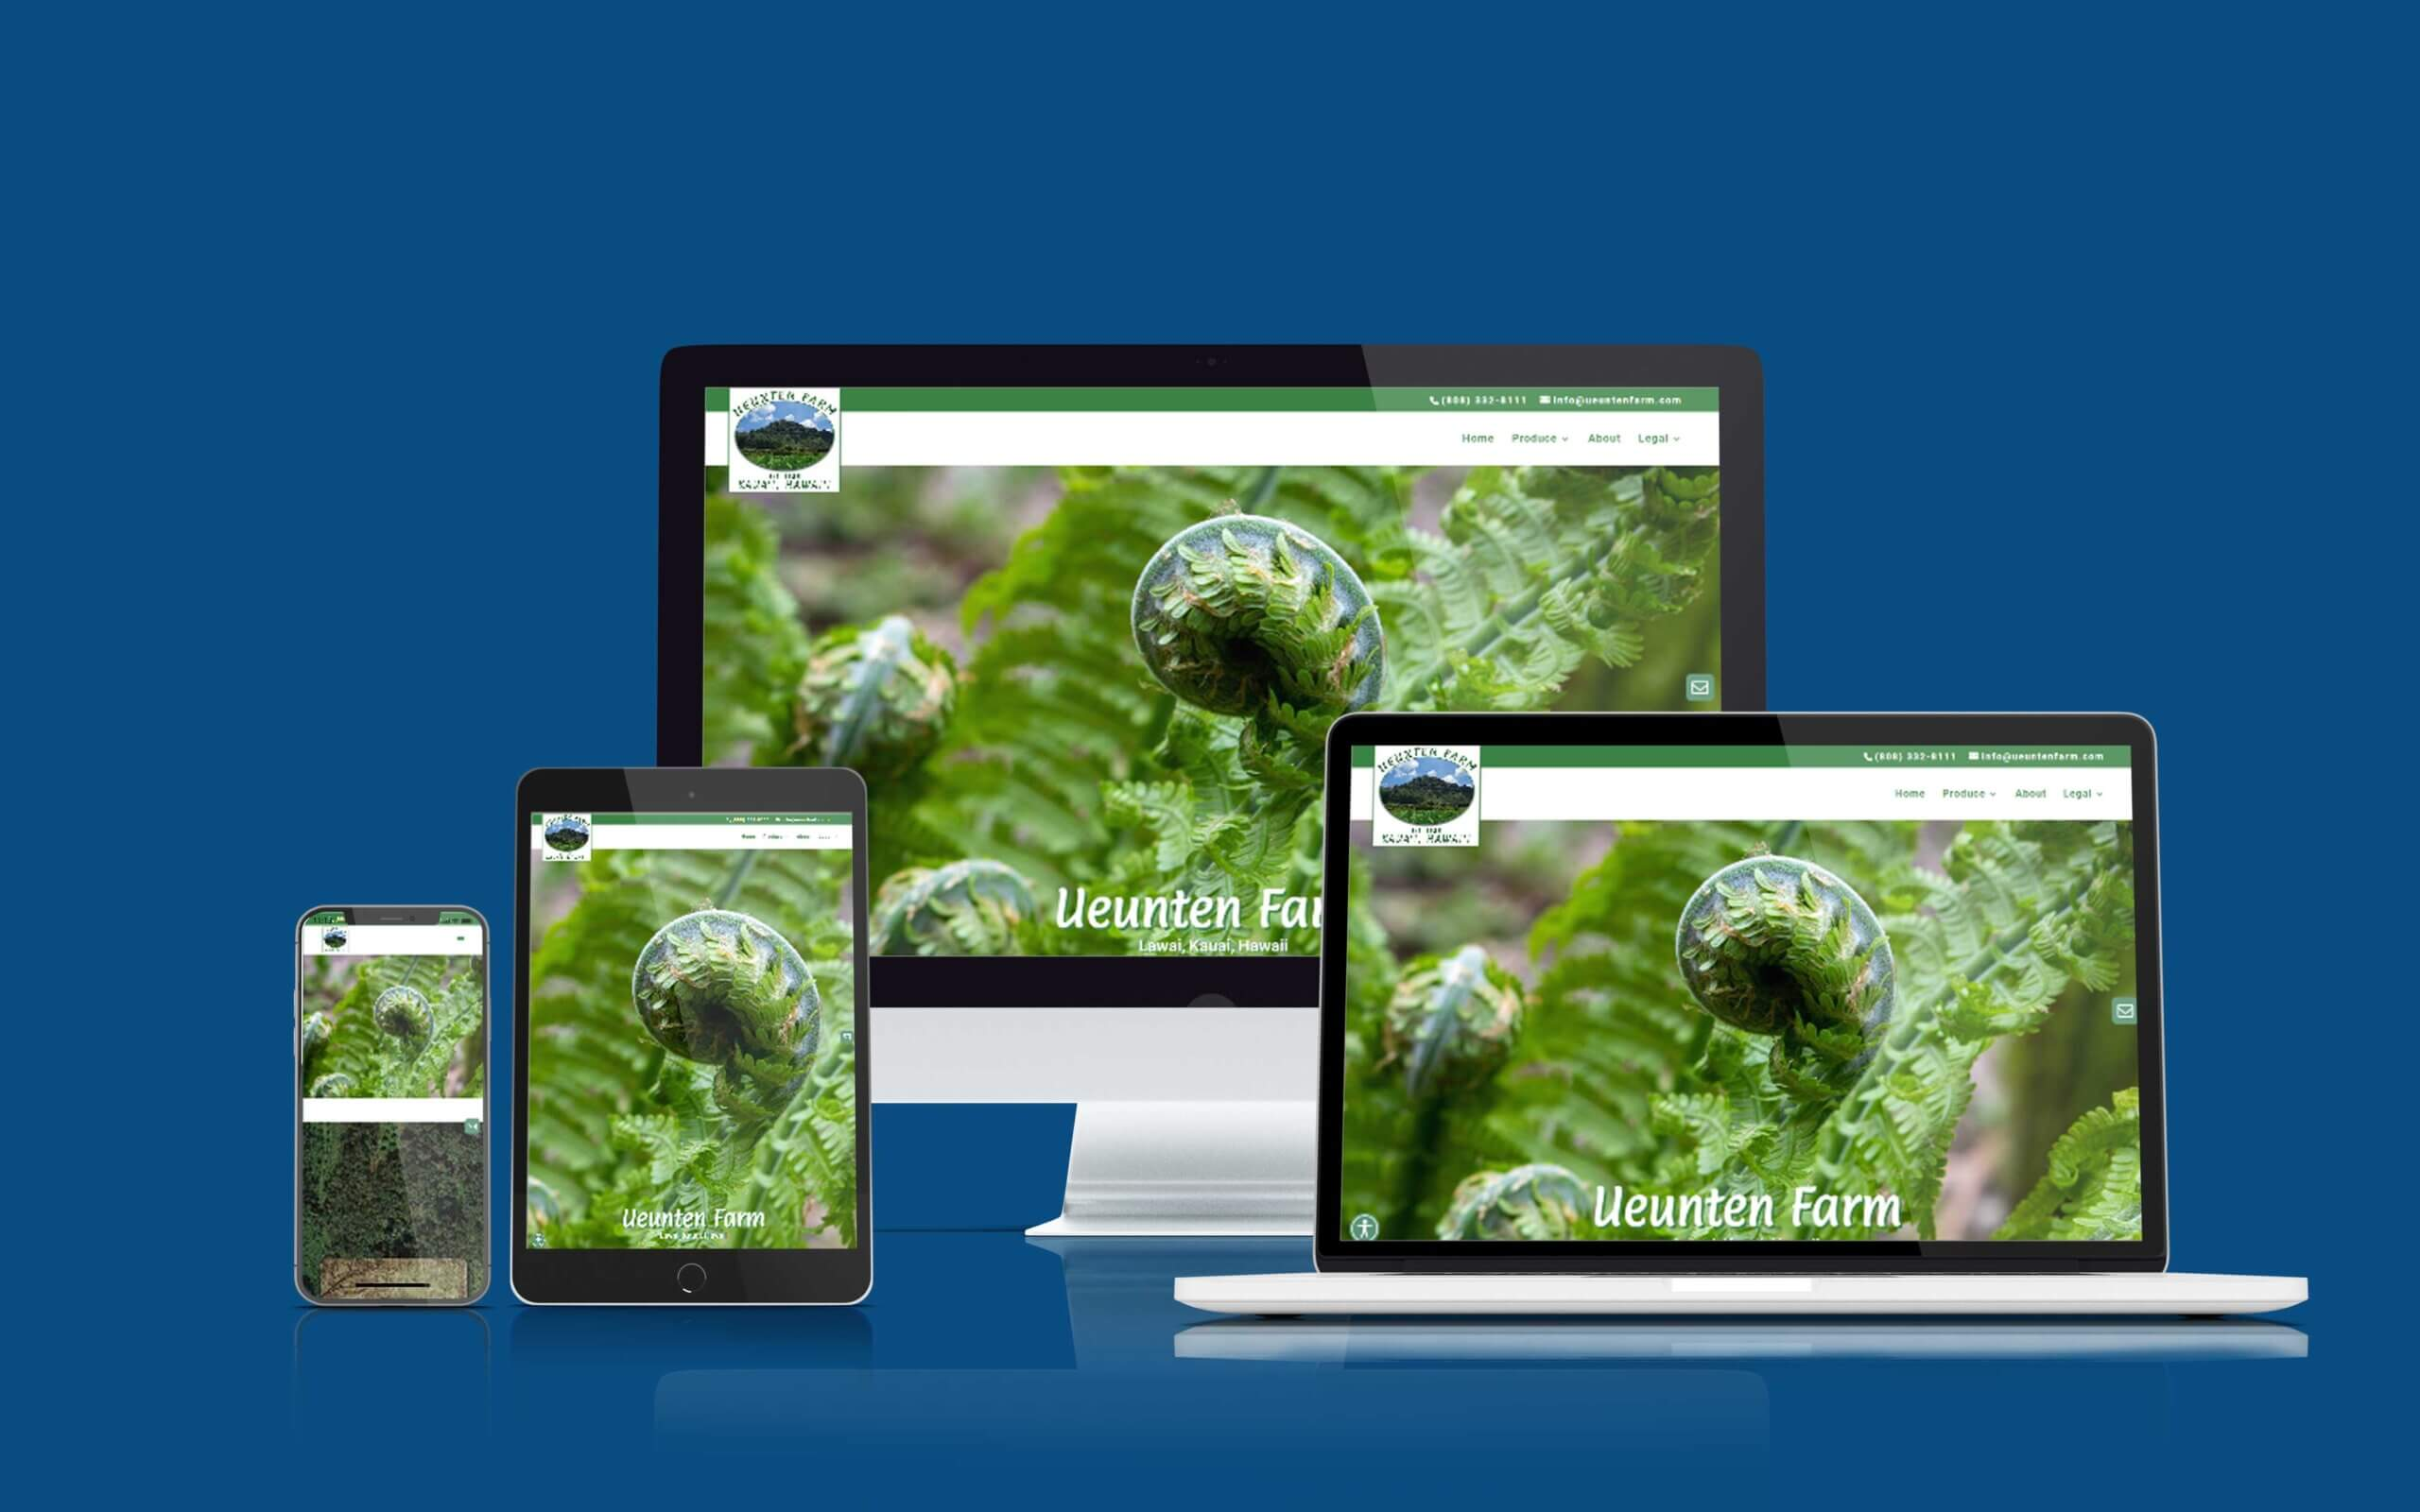 Recent Shaka Web Design Services Website Build - Ueunten Farm